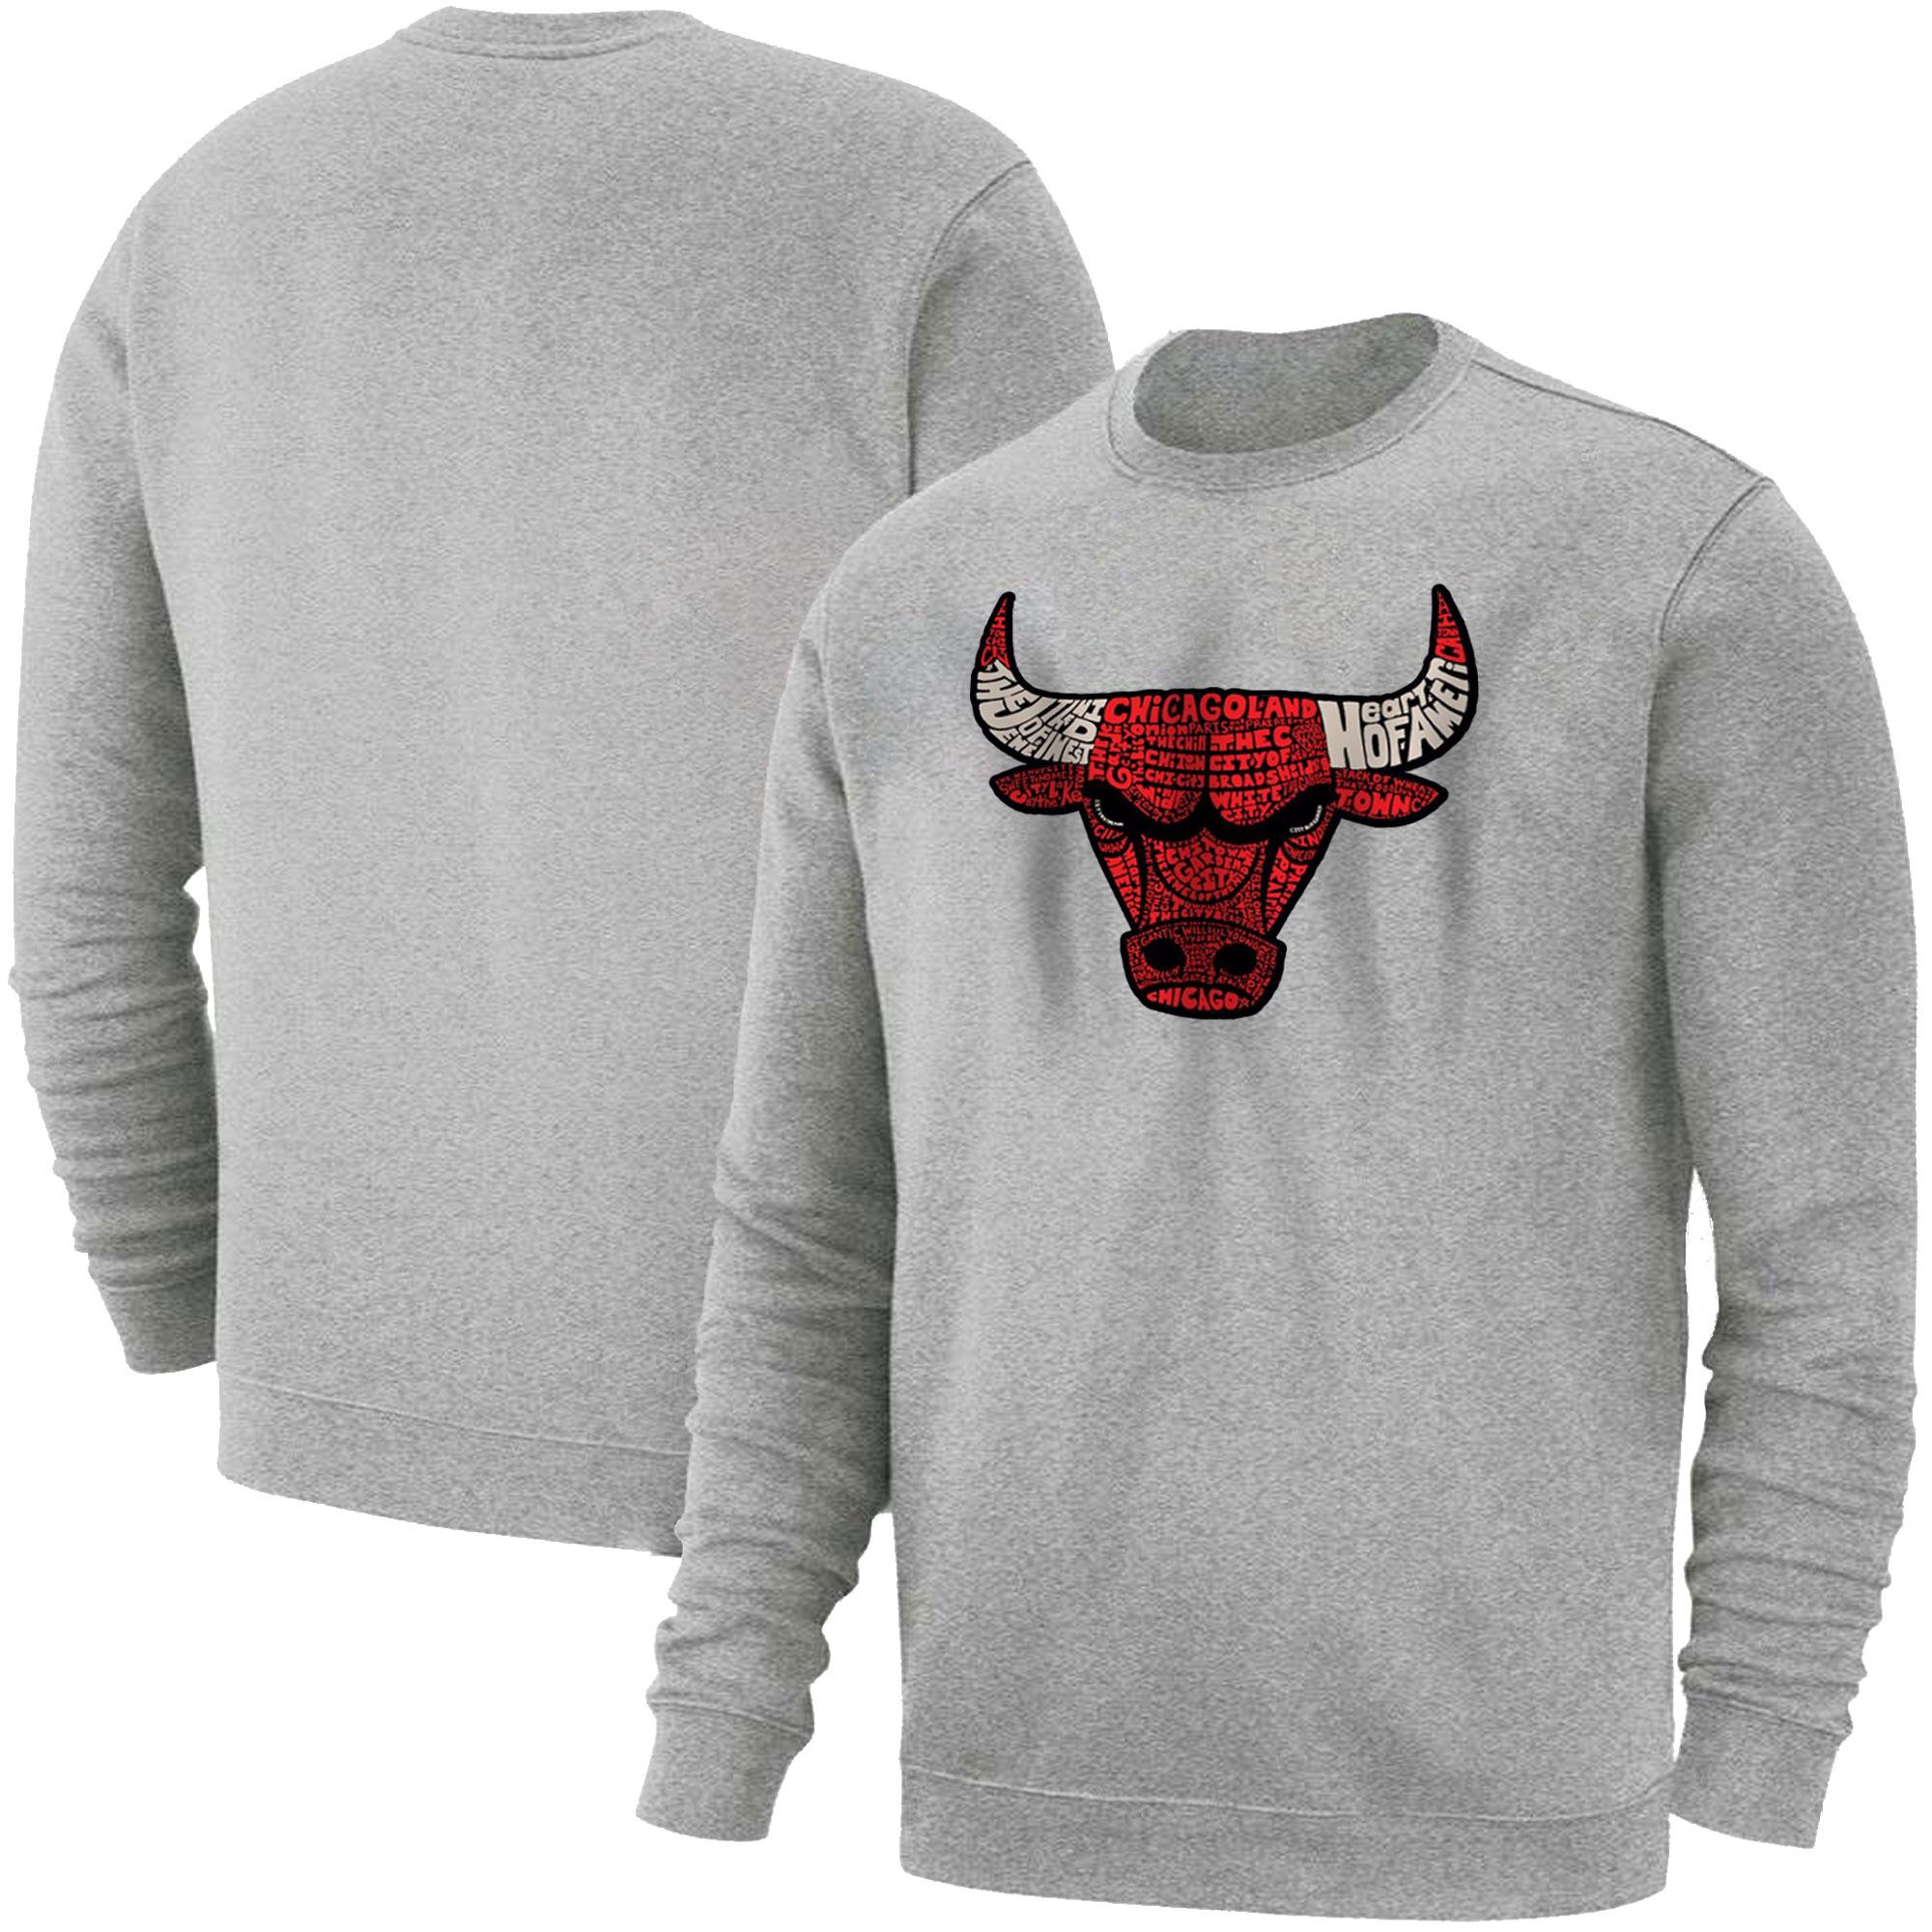 Chicago Bulls Basic (BSC-GRY-517-NBA-CHI-BULLS)